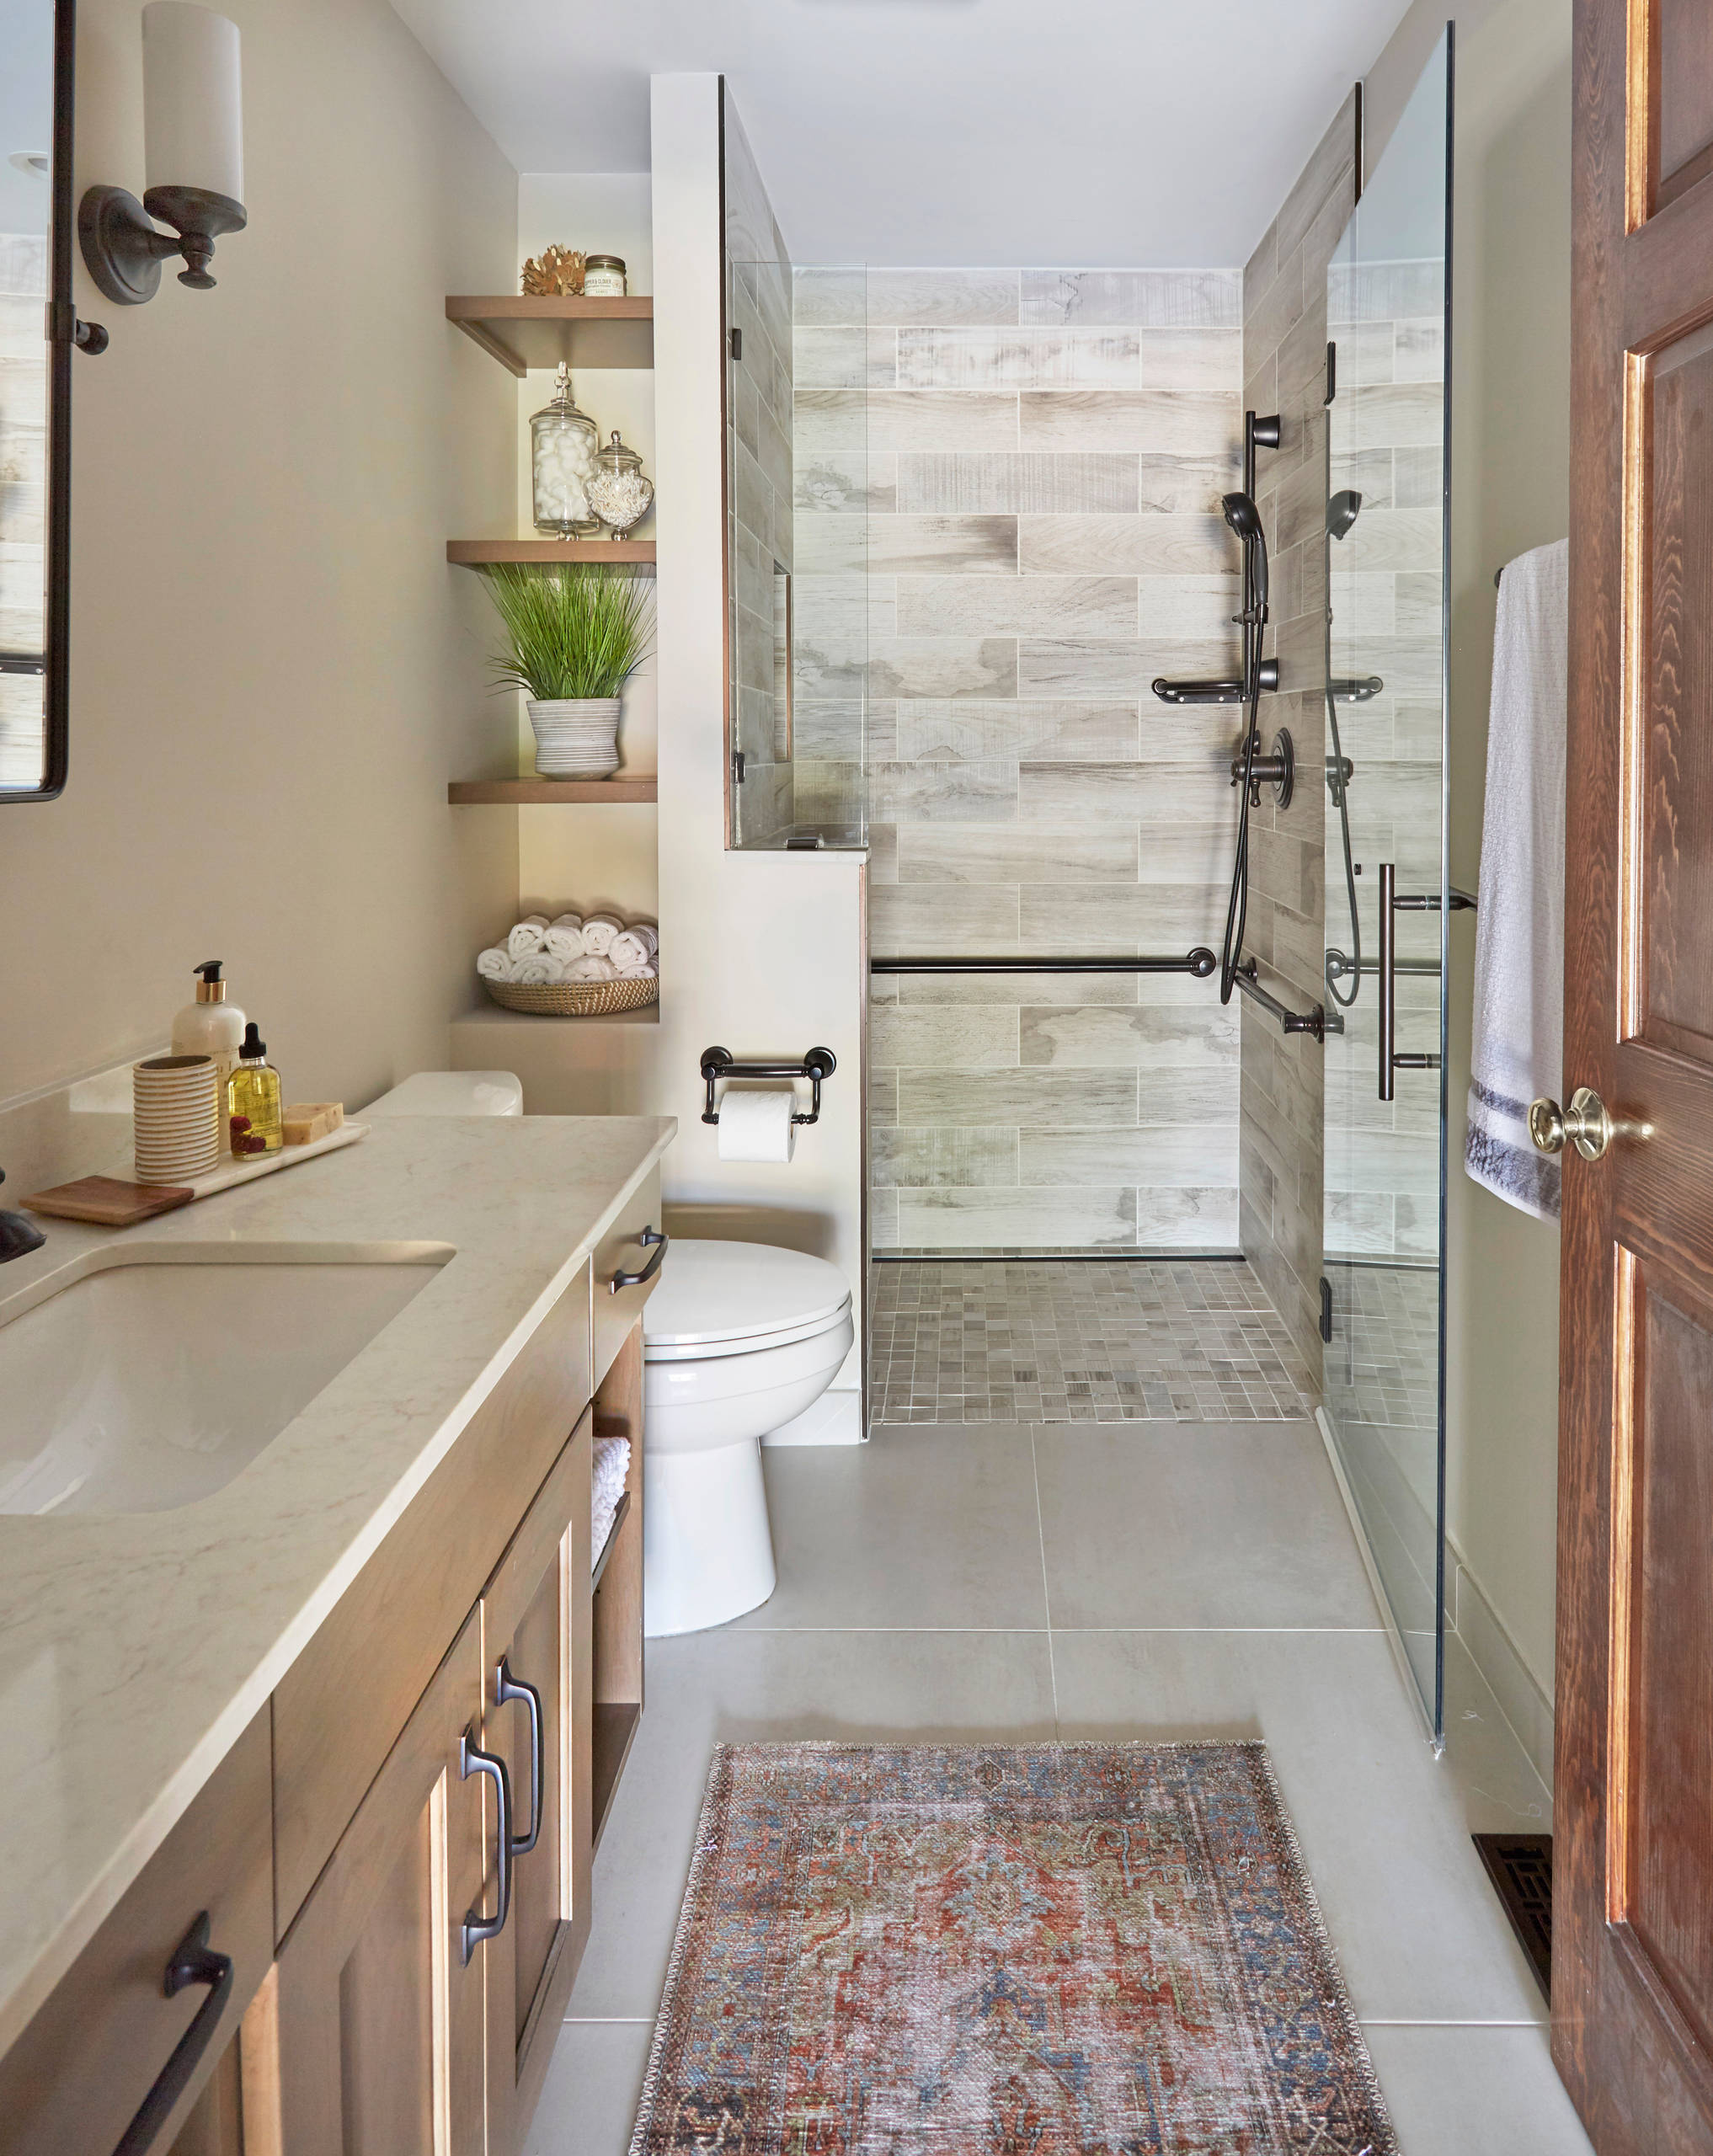 Toilet Paper Holder Height Craftsman Bathroom Frameless Glass Shower Door Pivot Mirror Wood Look Tile